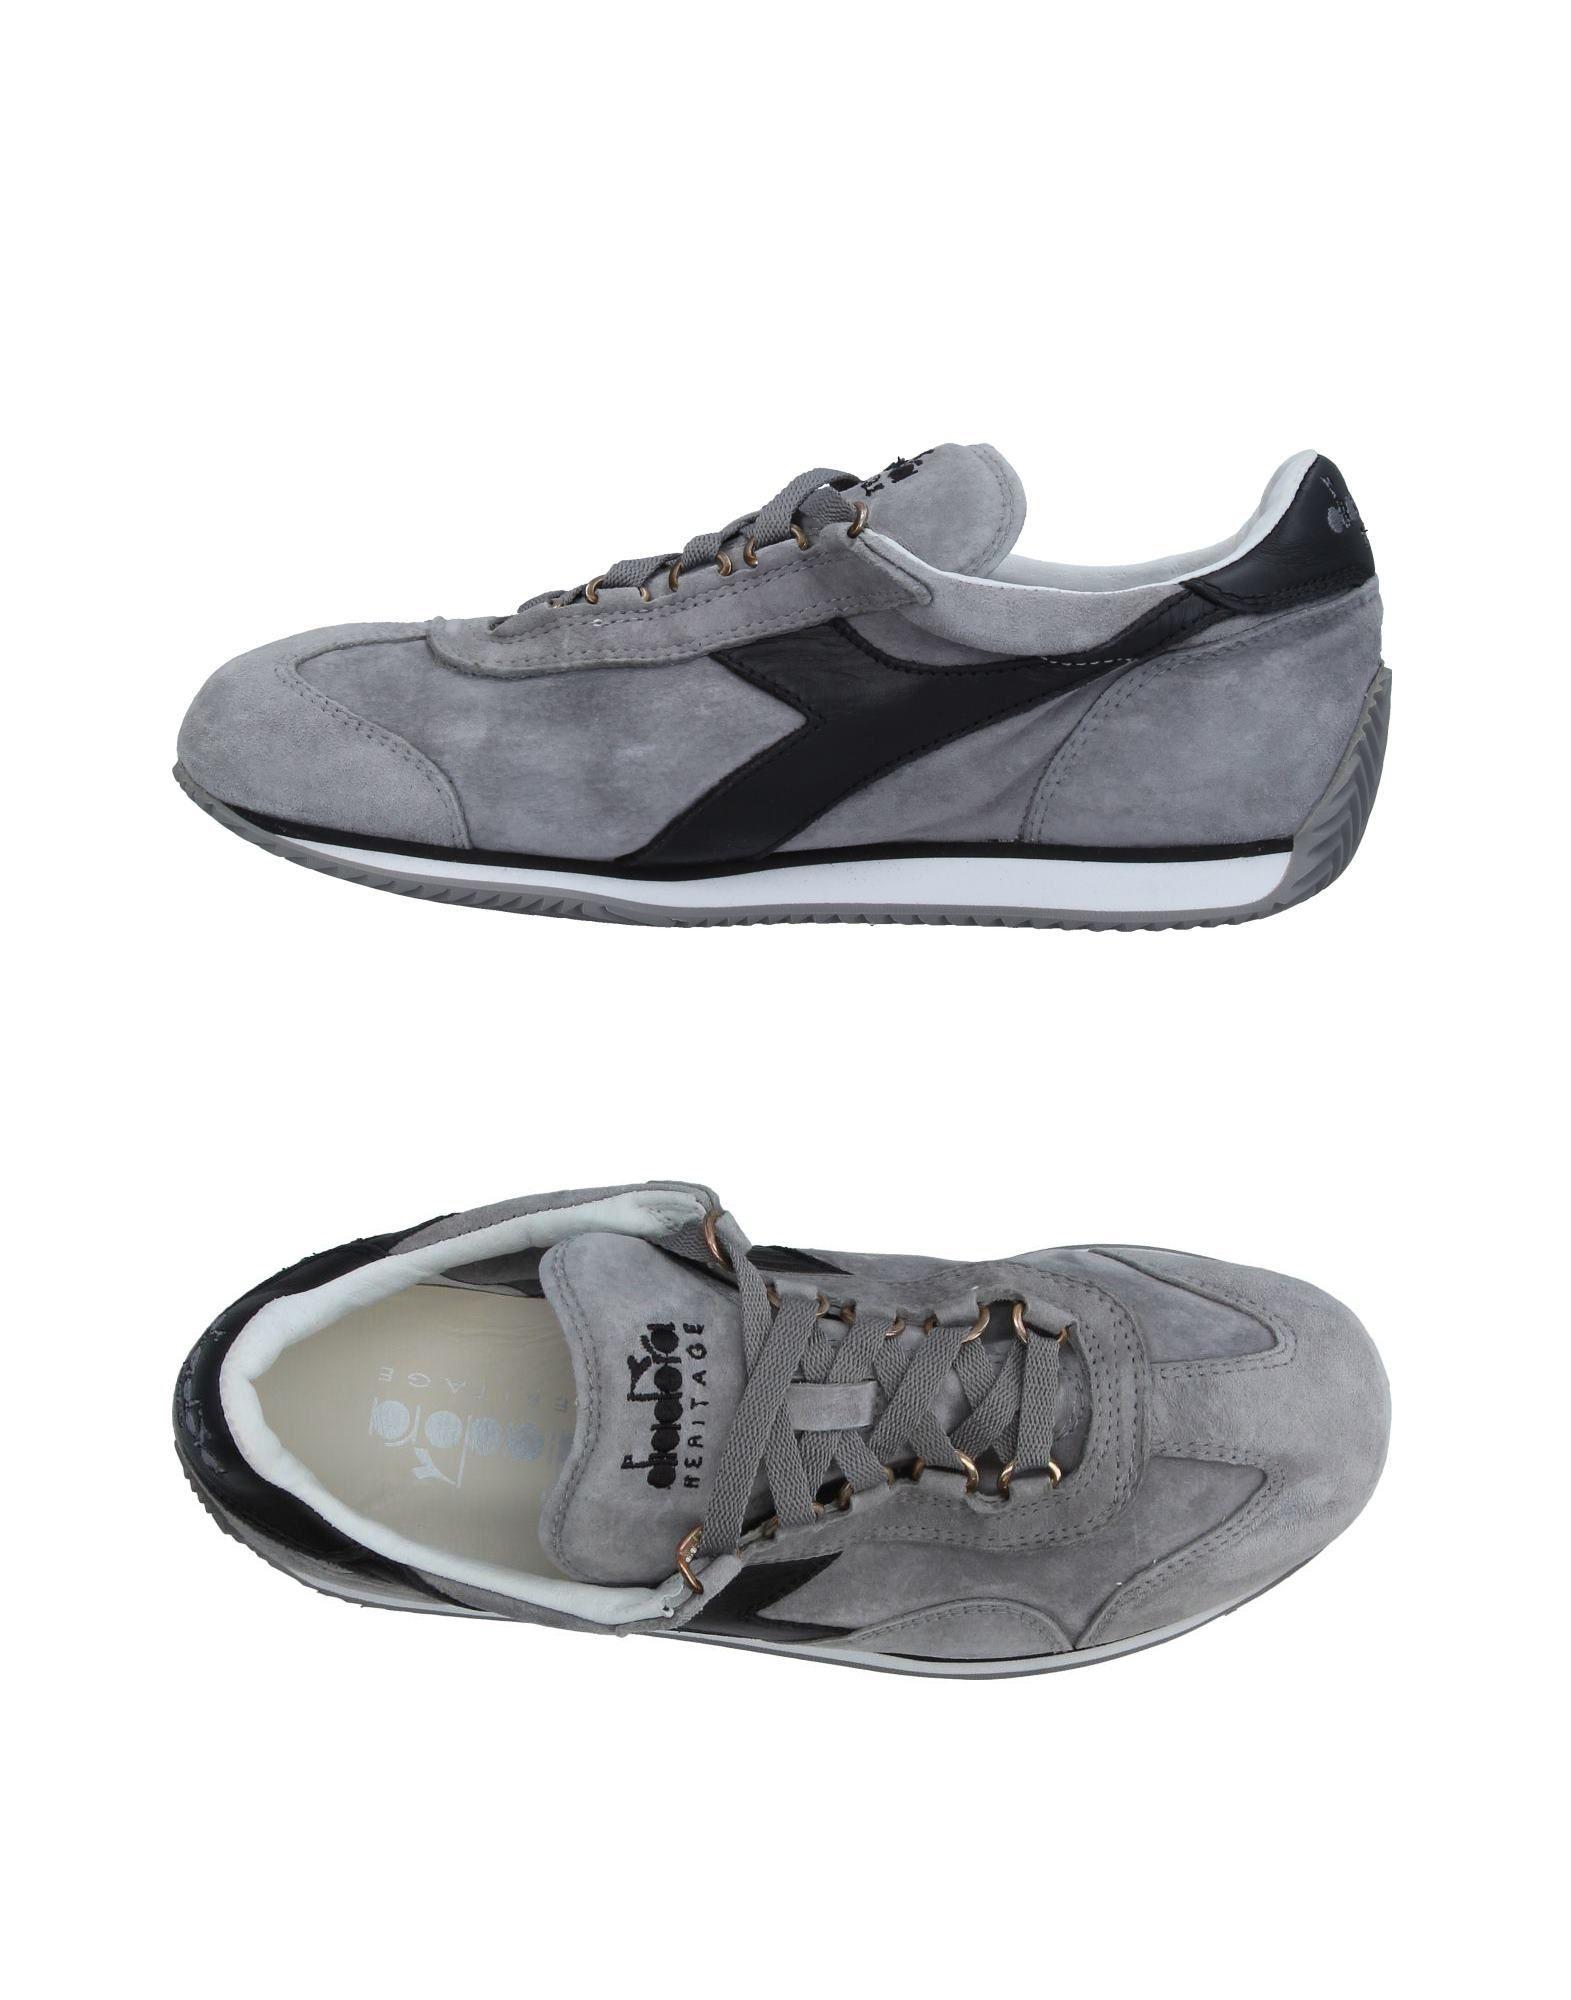 DIADORA HERITAGE Низкие кеды и кроссовки diadora heritage низкие кеды и кроссовки